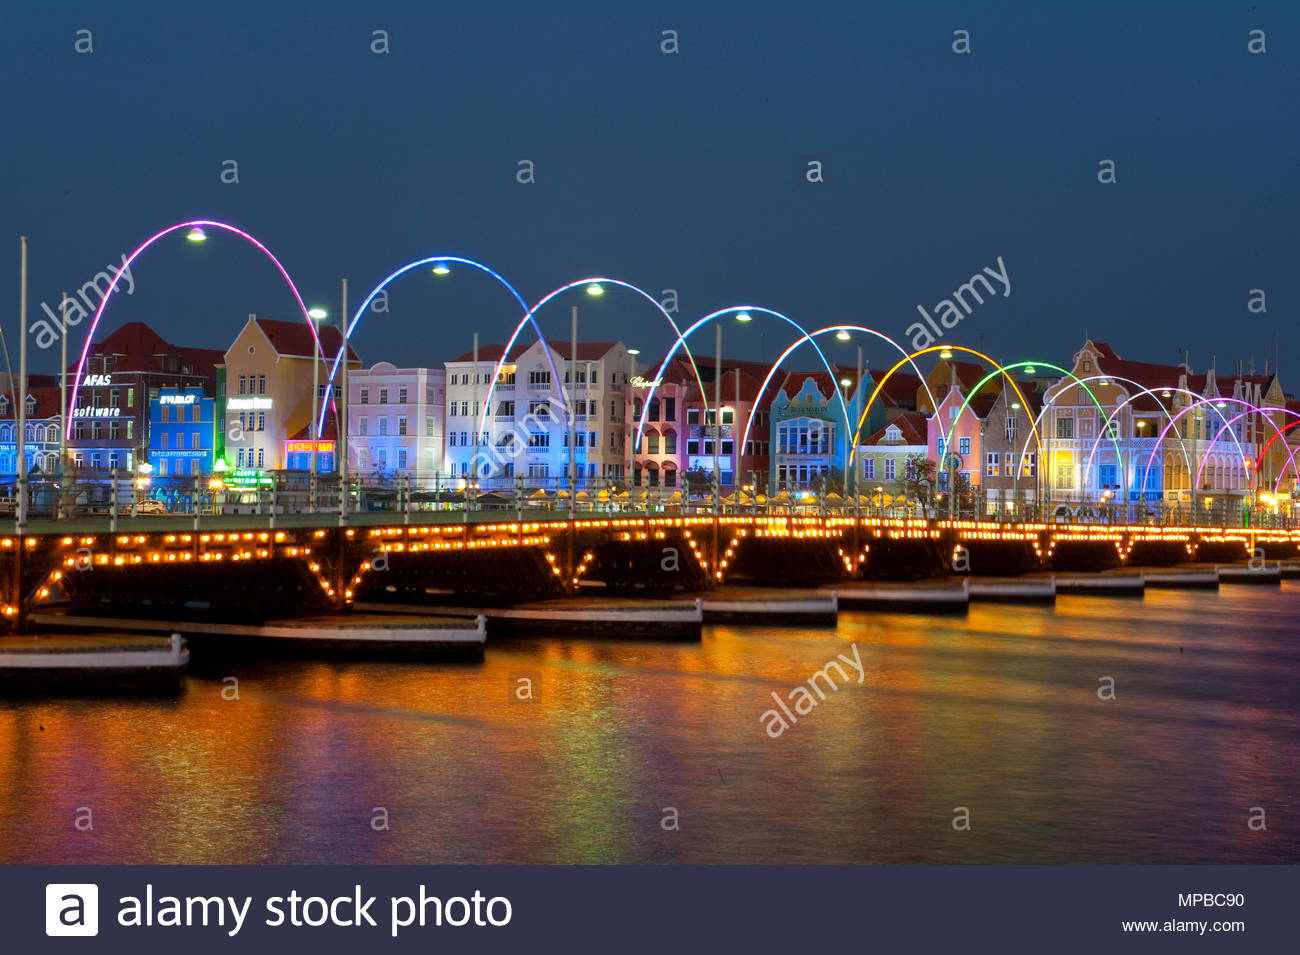 Willemstad, Curacao, Queen Emma bridge | Königin Emma Brücke - Stock Image